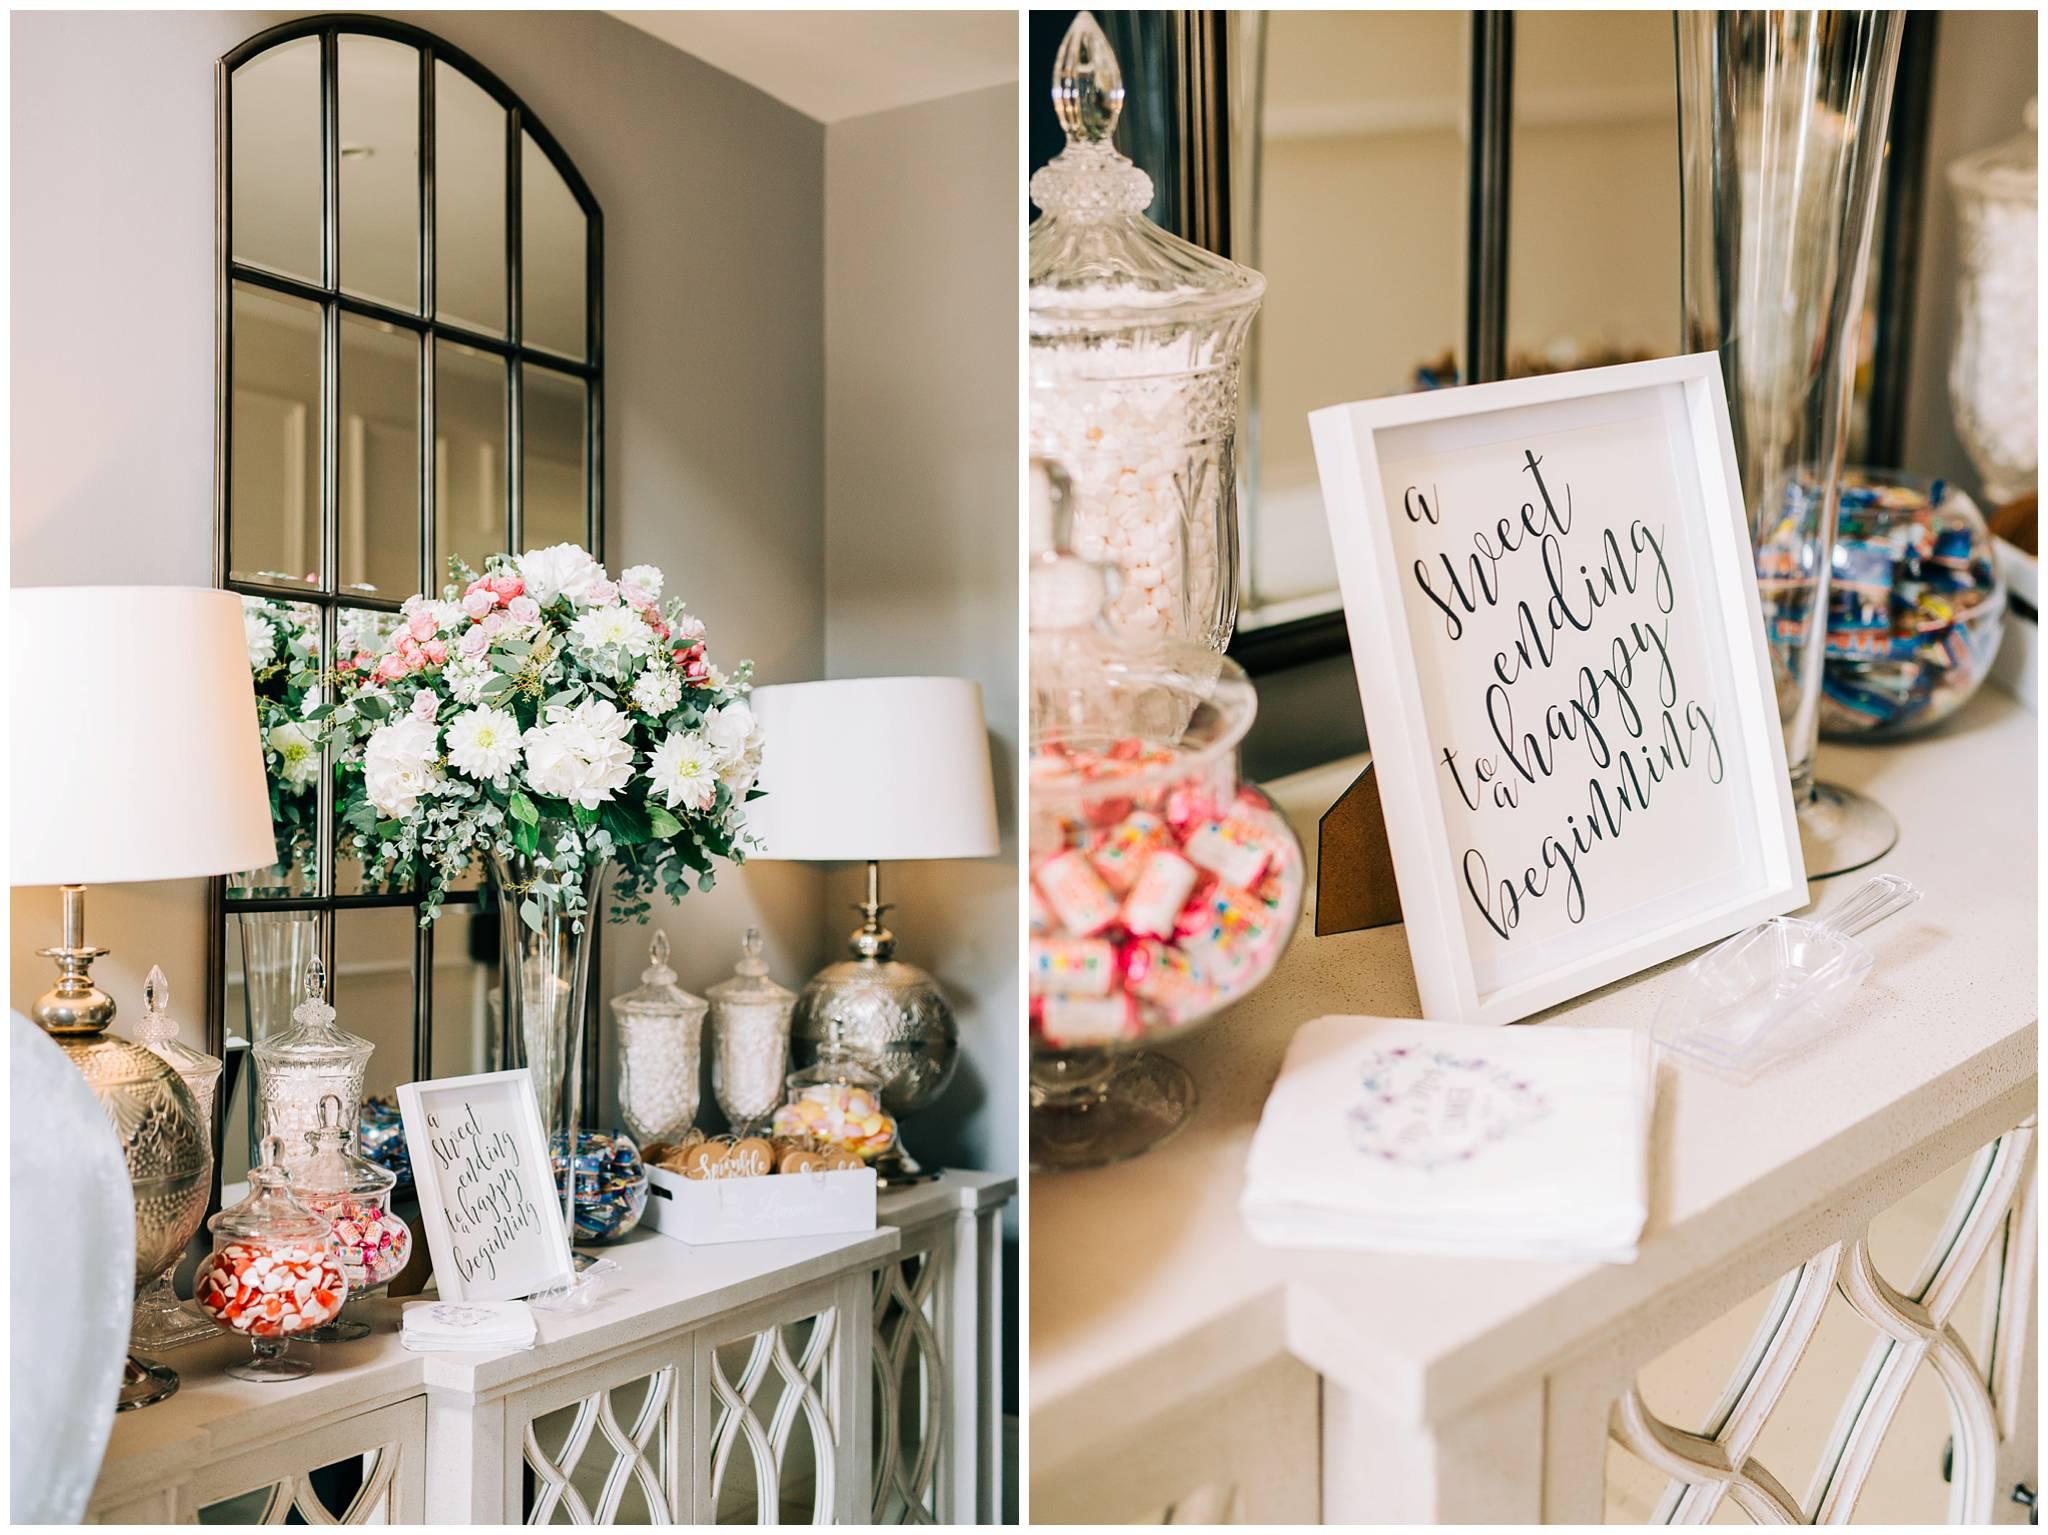 Summer Garden Wedding - The Old Vicarage Boutique Hotel17.jpg